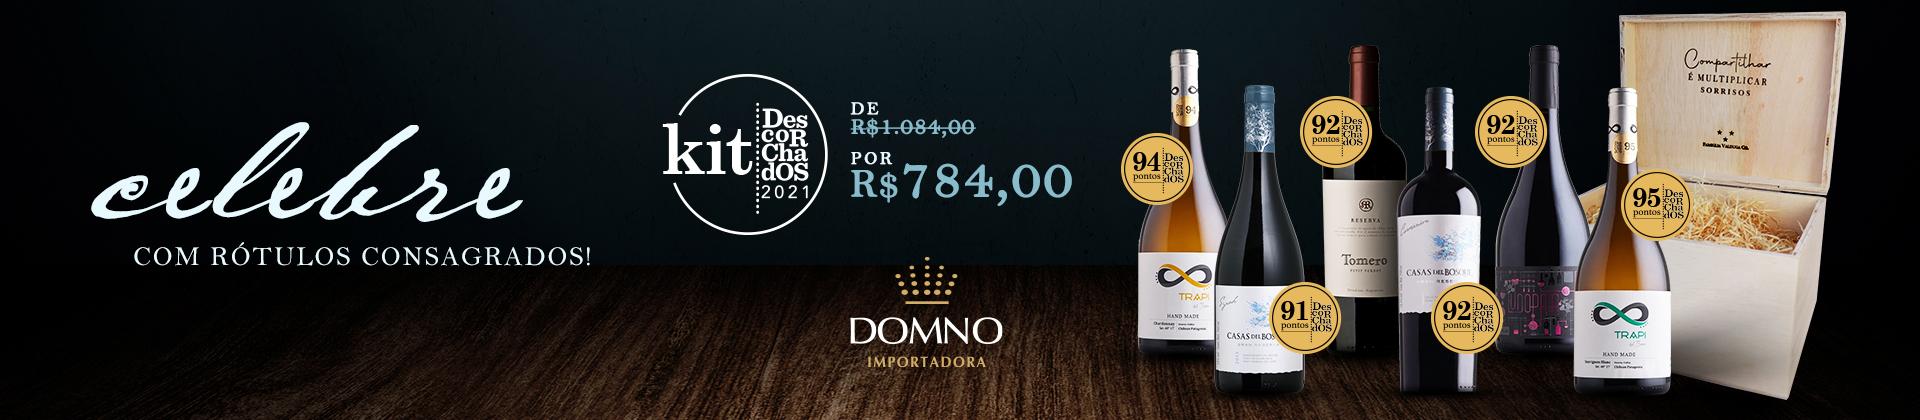 Kit Descorchados Domno 2021 (1920x420)